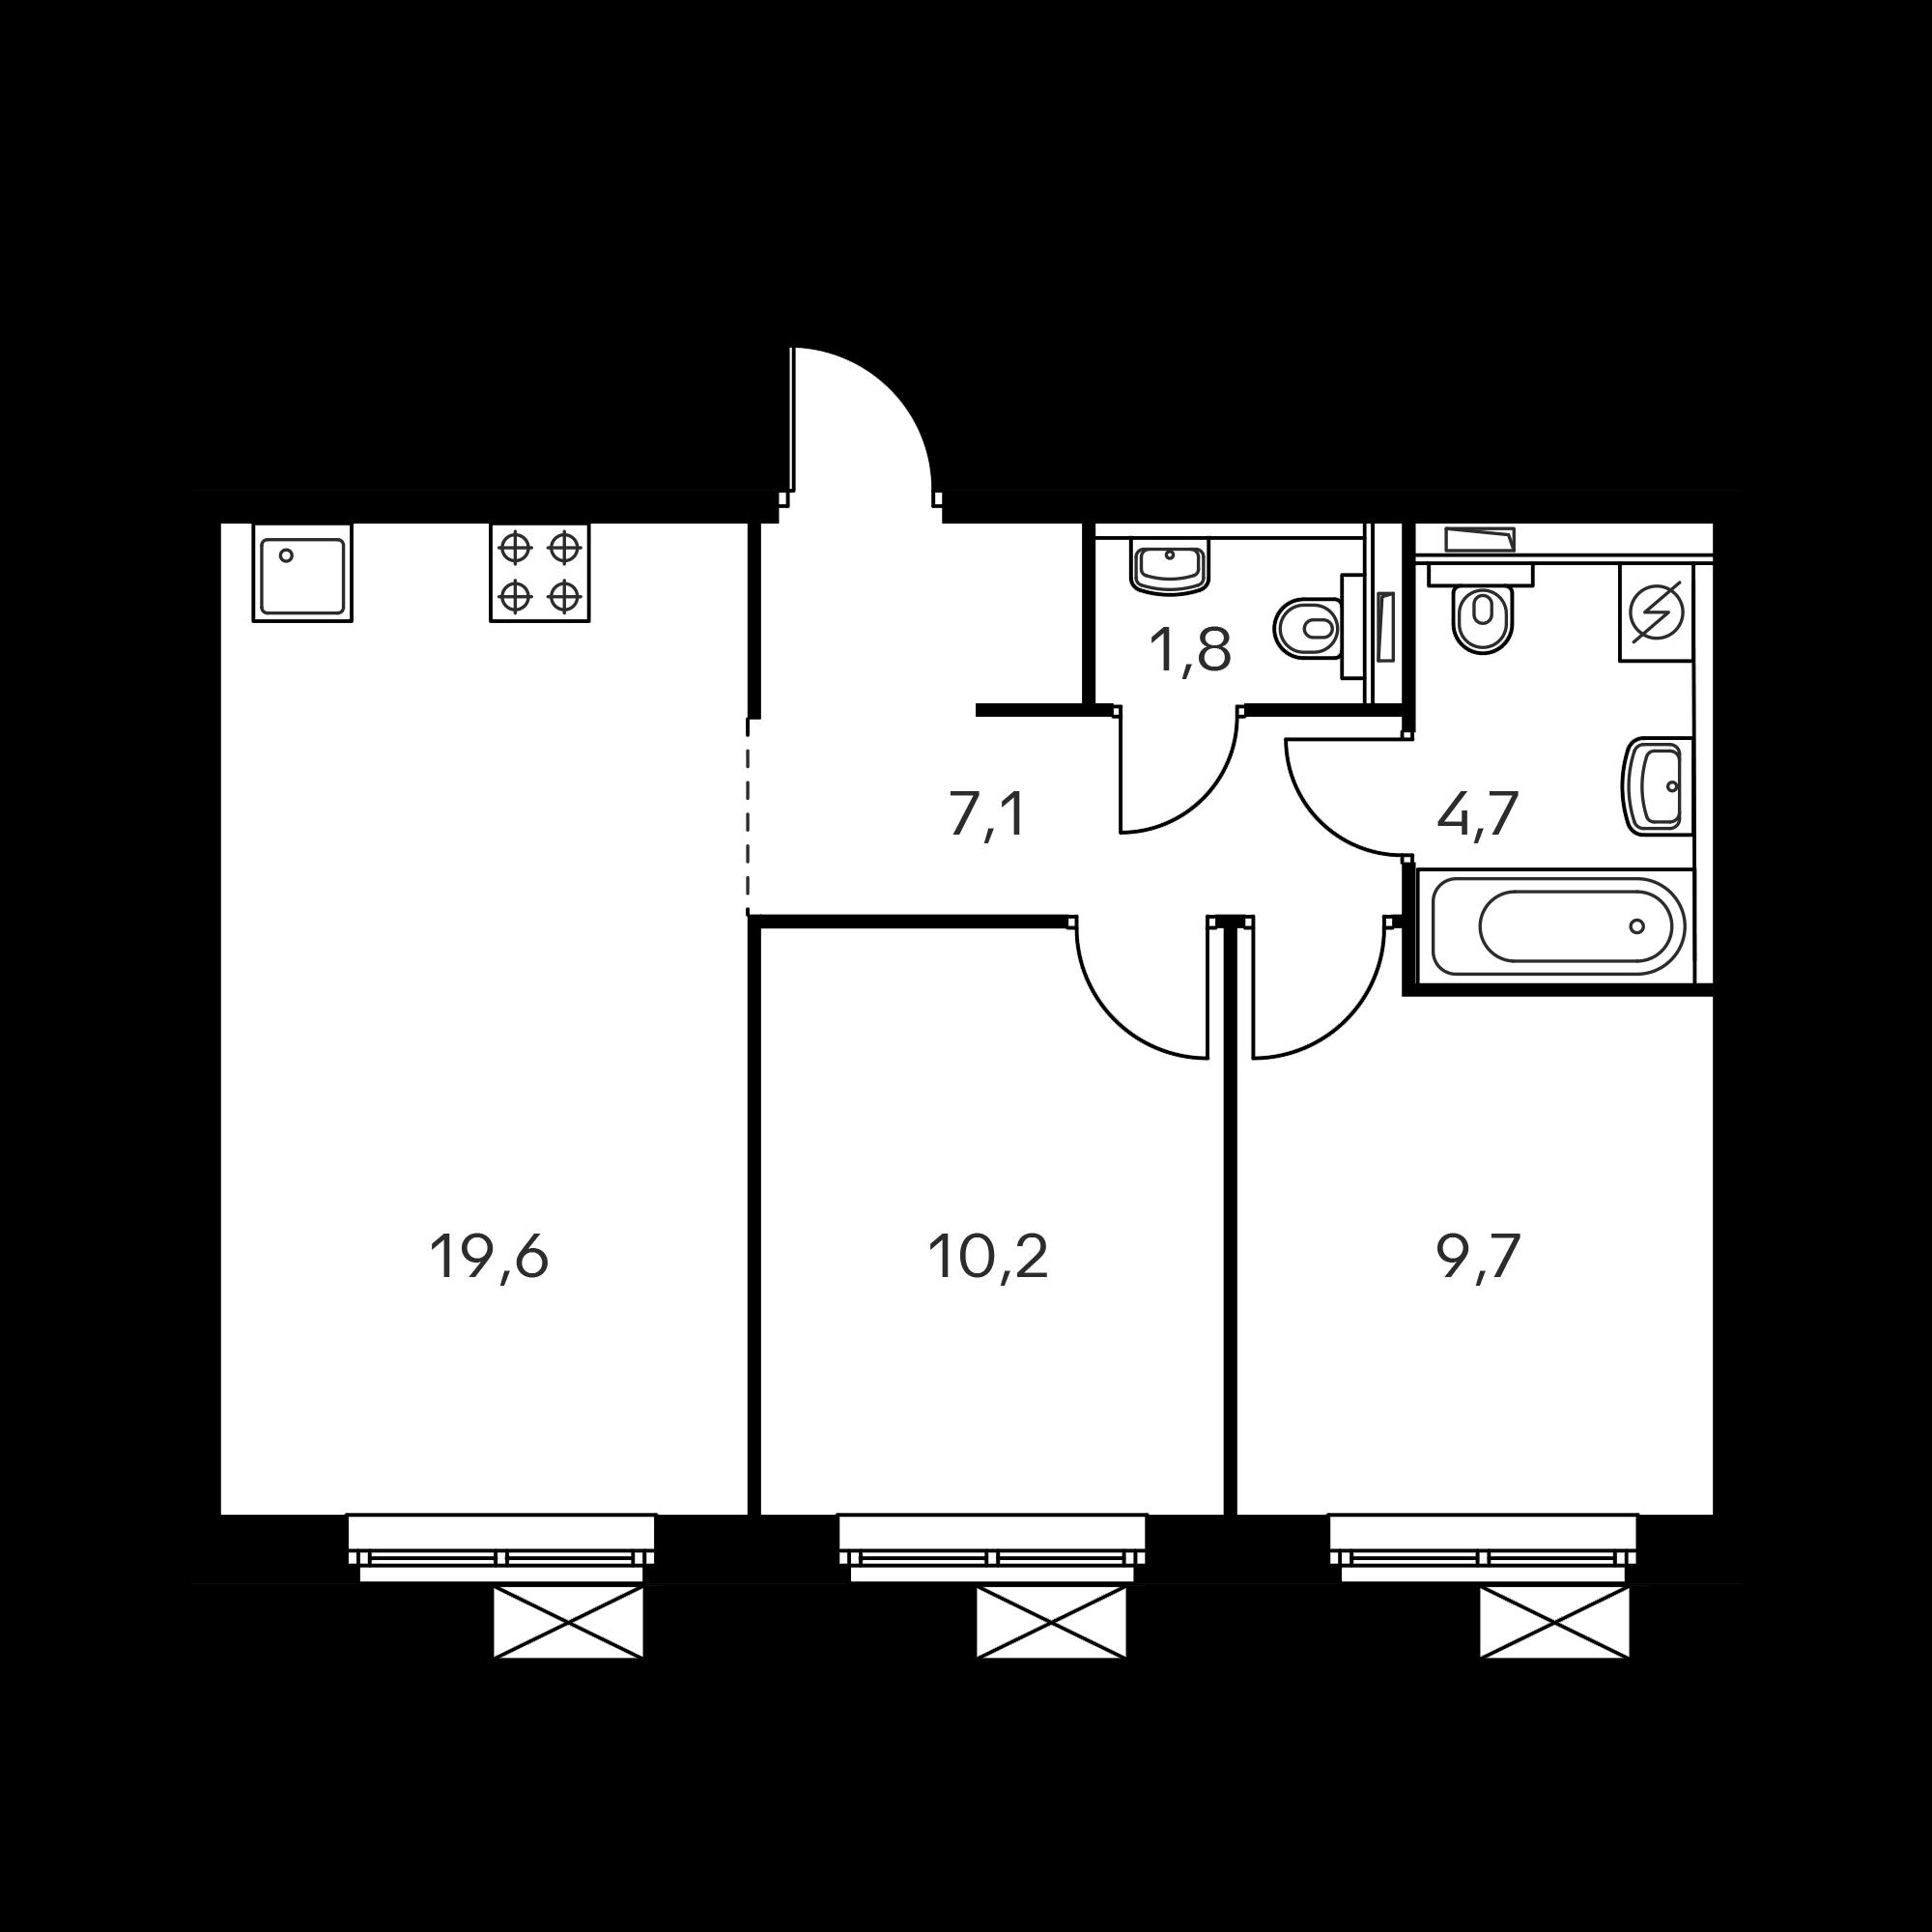 2ES9_9.3-1_S_Z-4